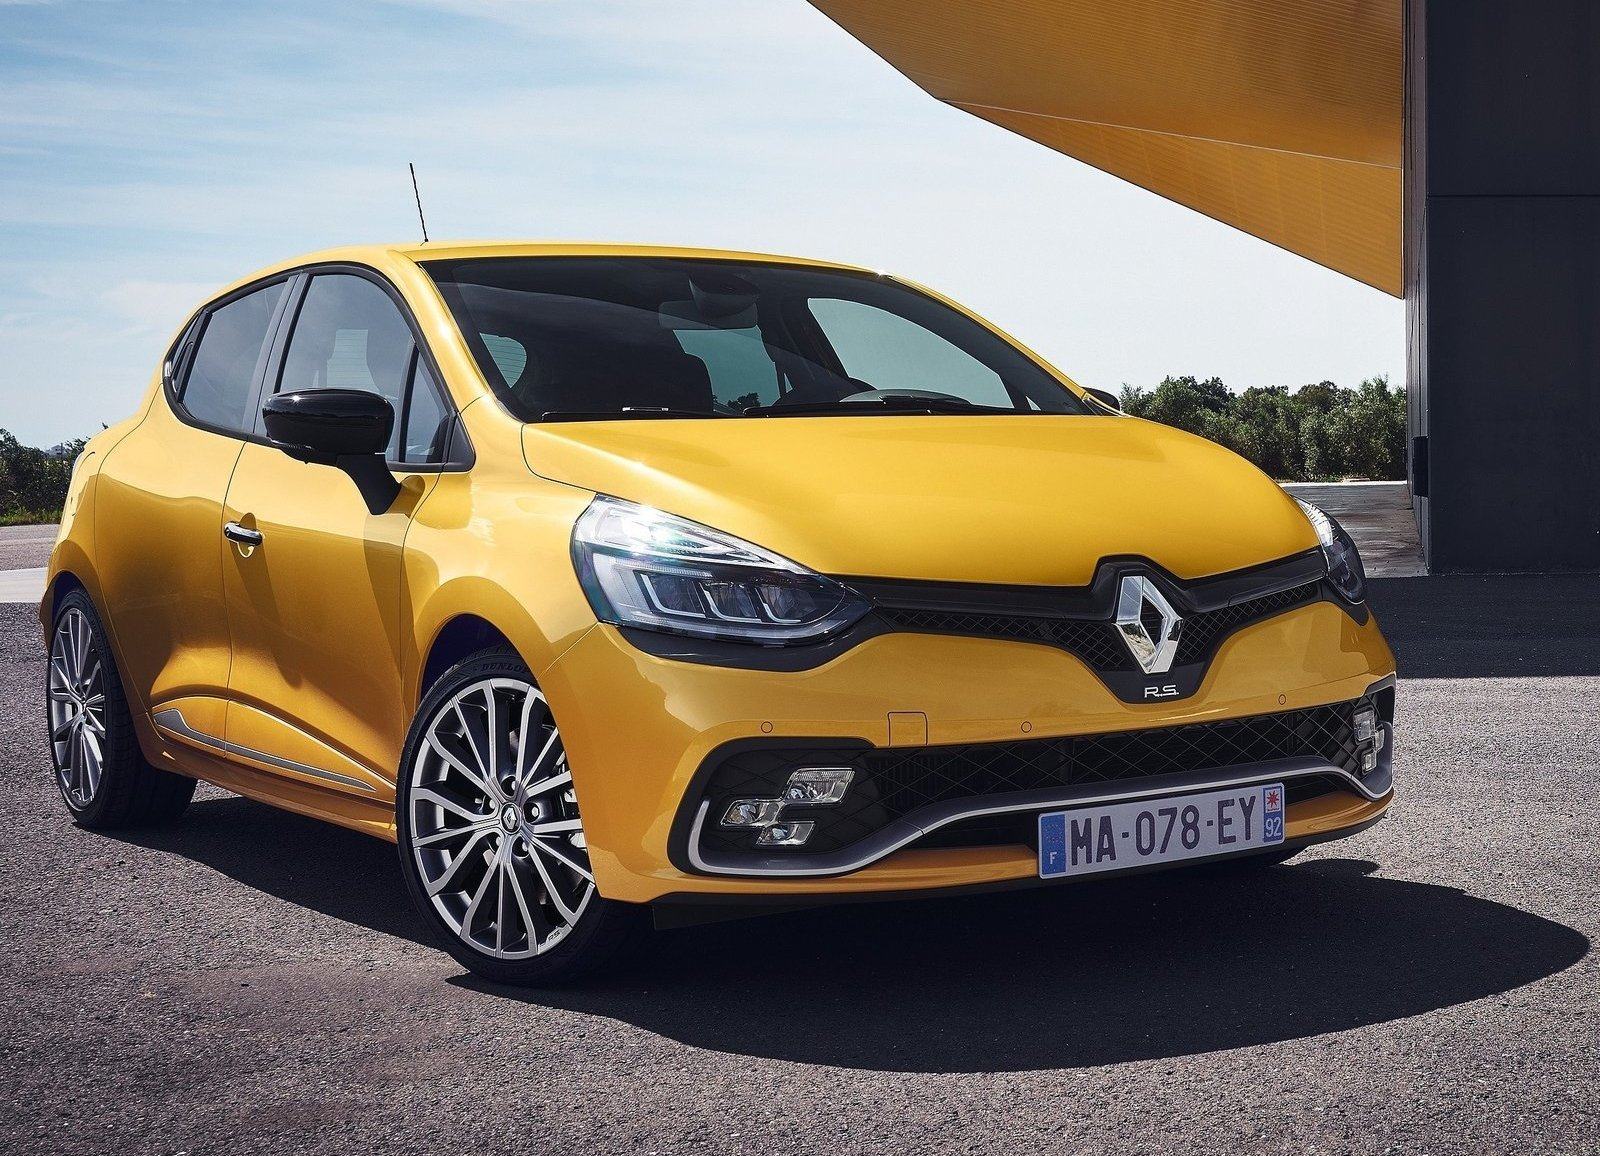 Foto de Renault Clio R.S. 2017 (1/14)